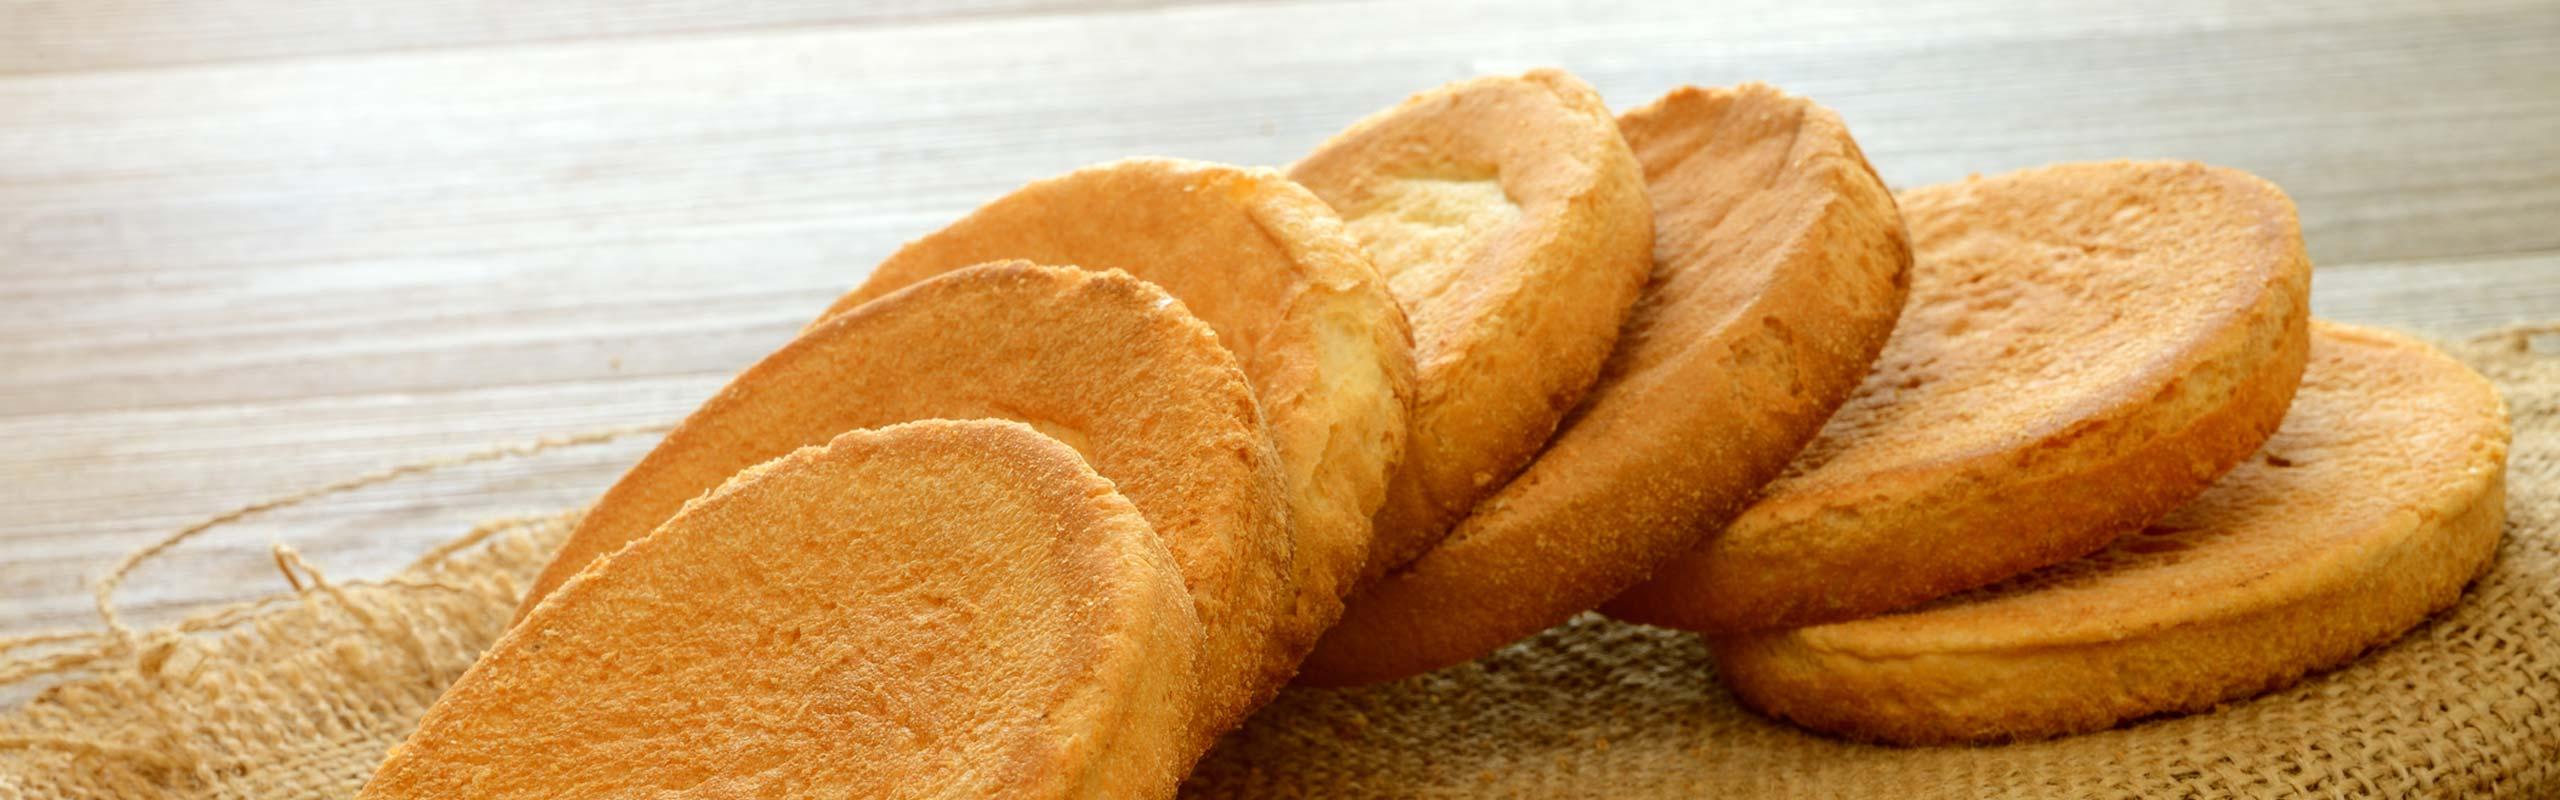 Fette biscottate olandesi Huber